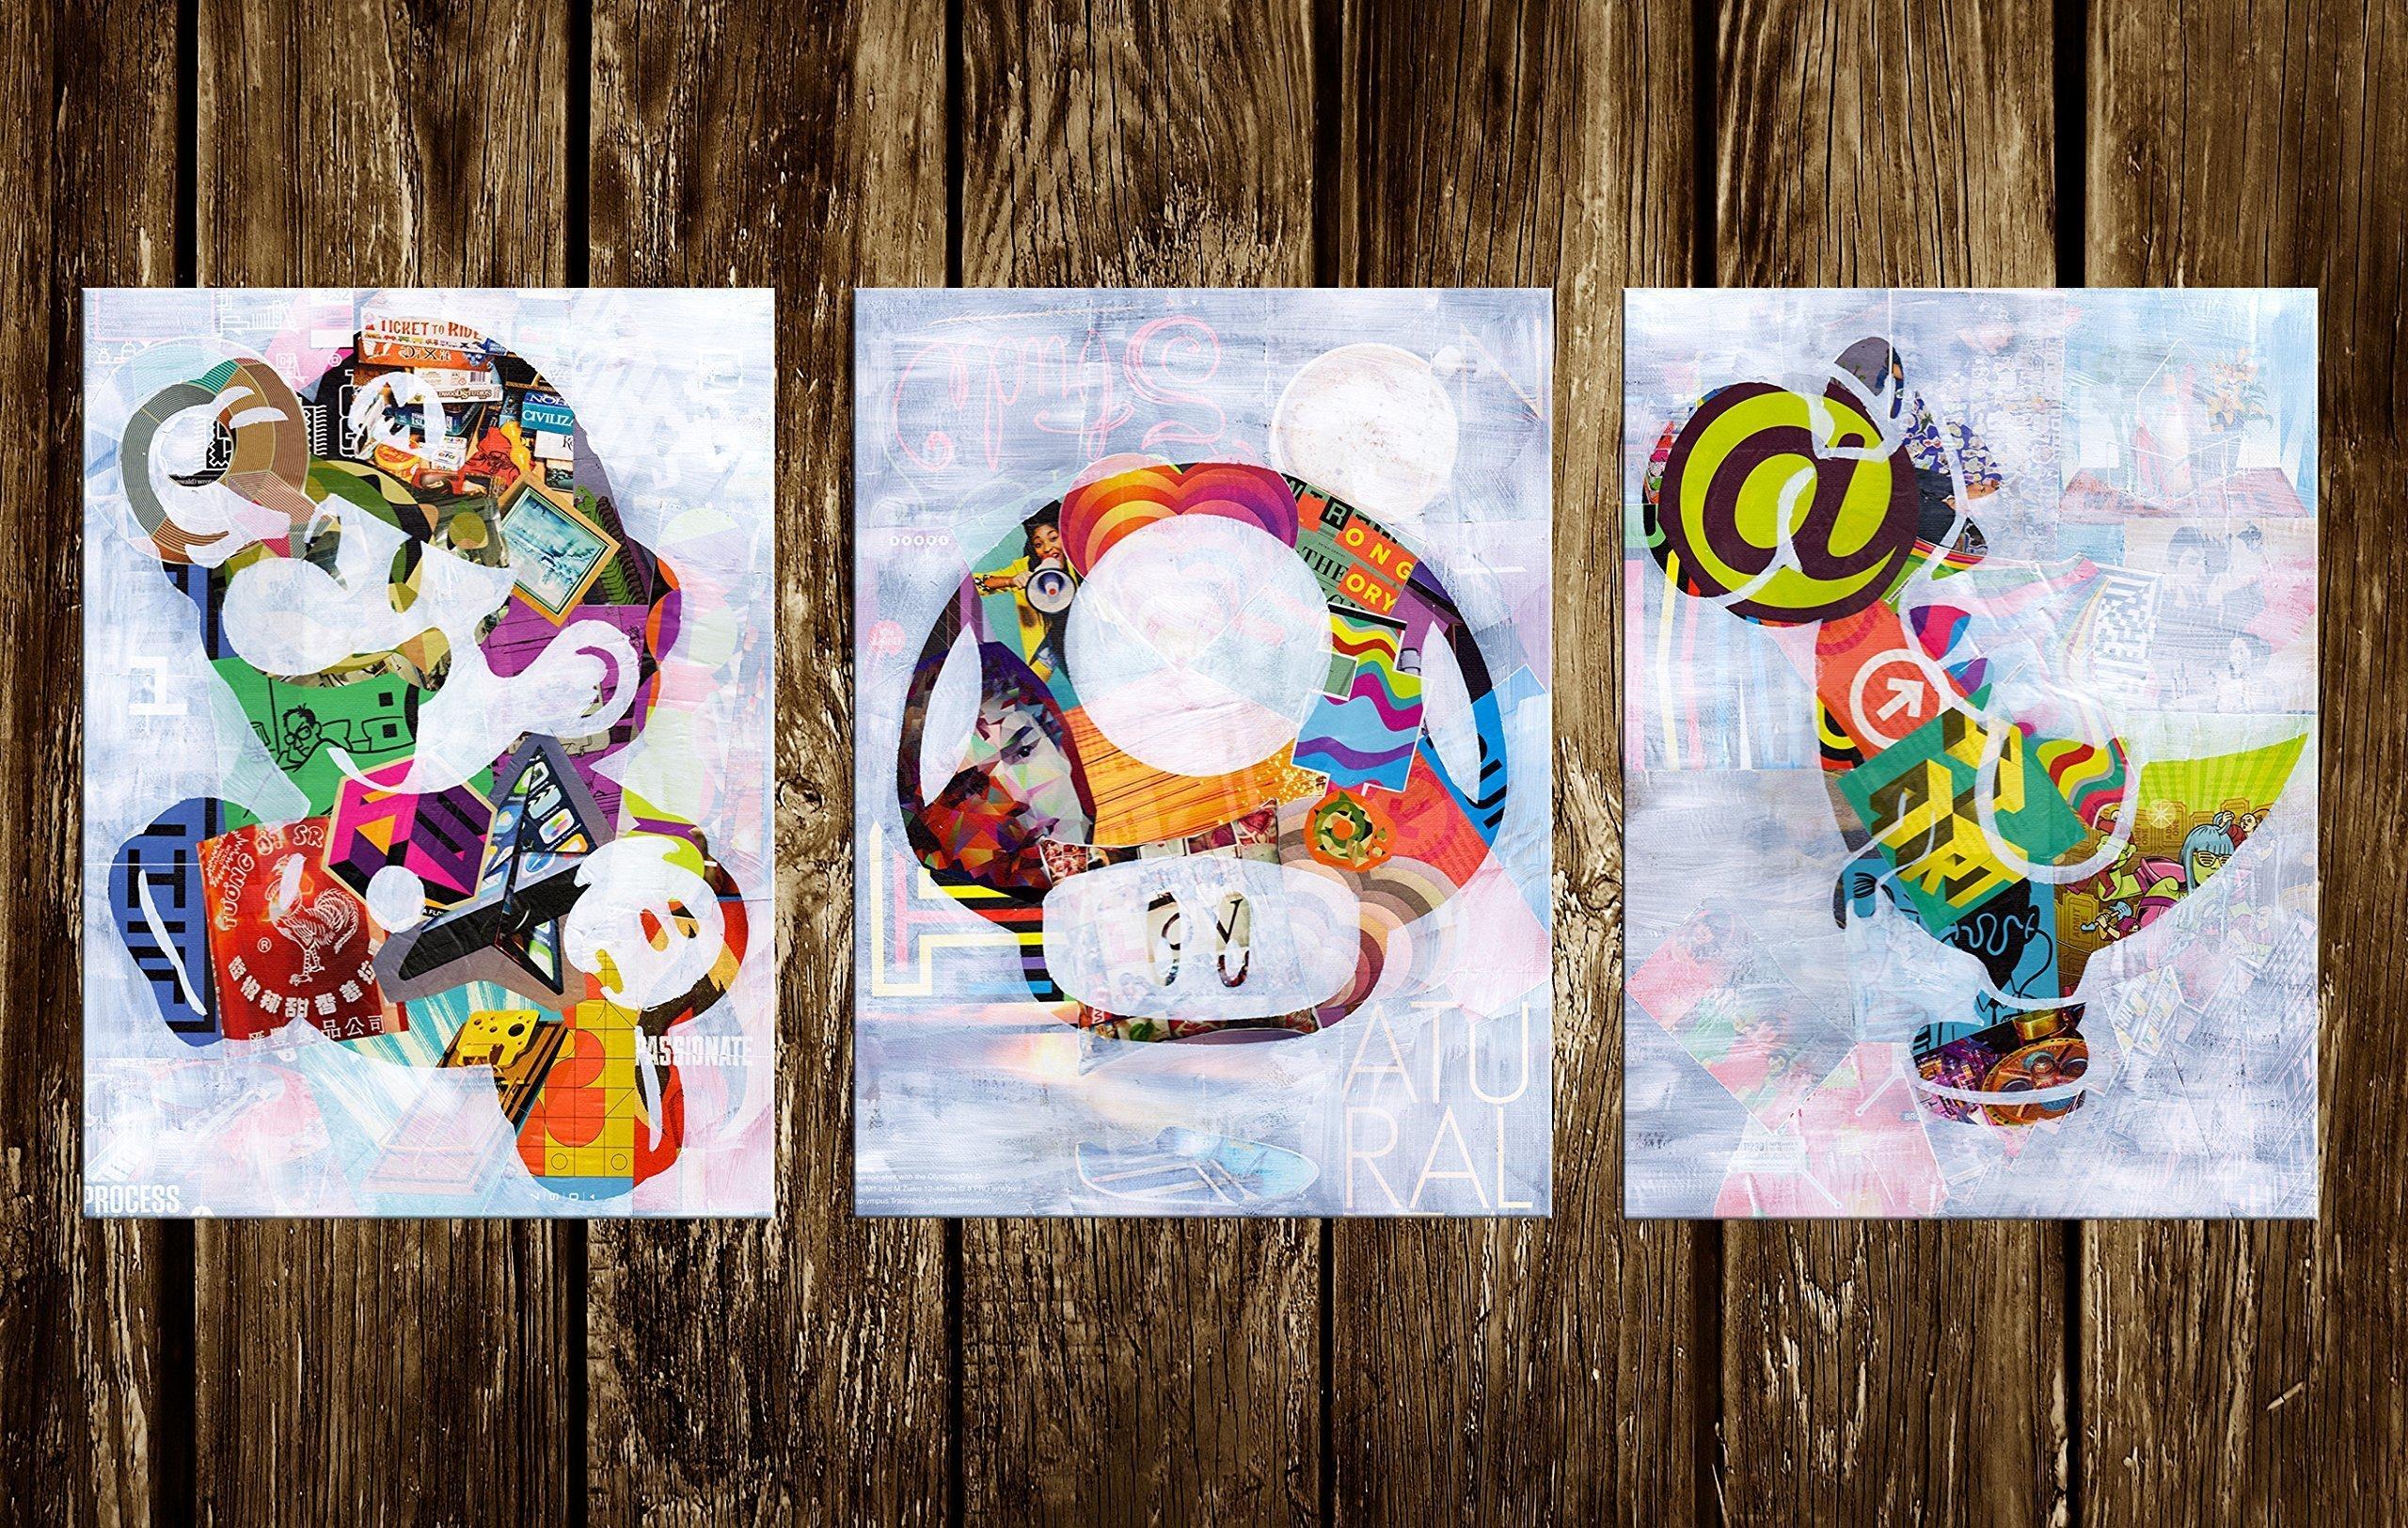 Mario Wall Art Set of three Prints (Availabe in sizes 8 x 10, 11 x 14, 16 x 20, 20 x 24)